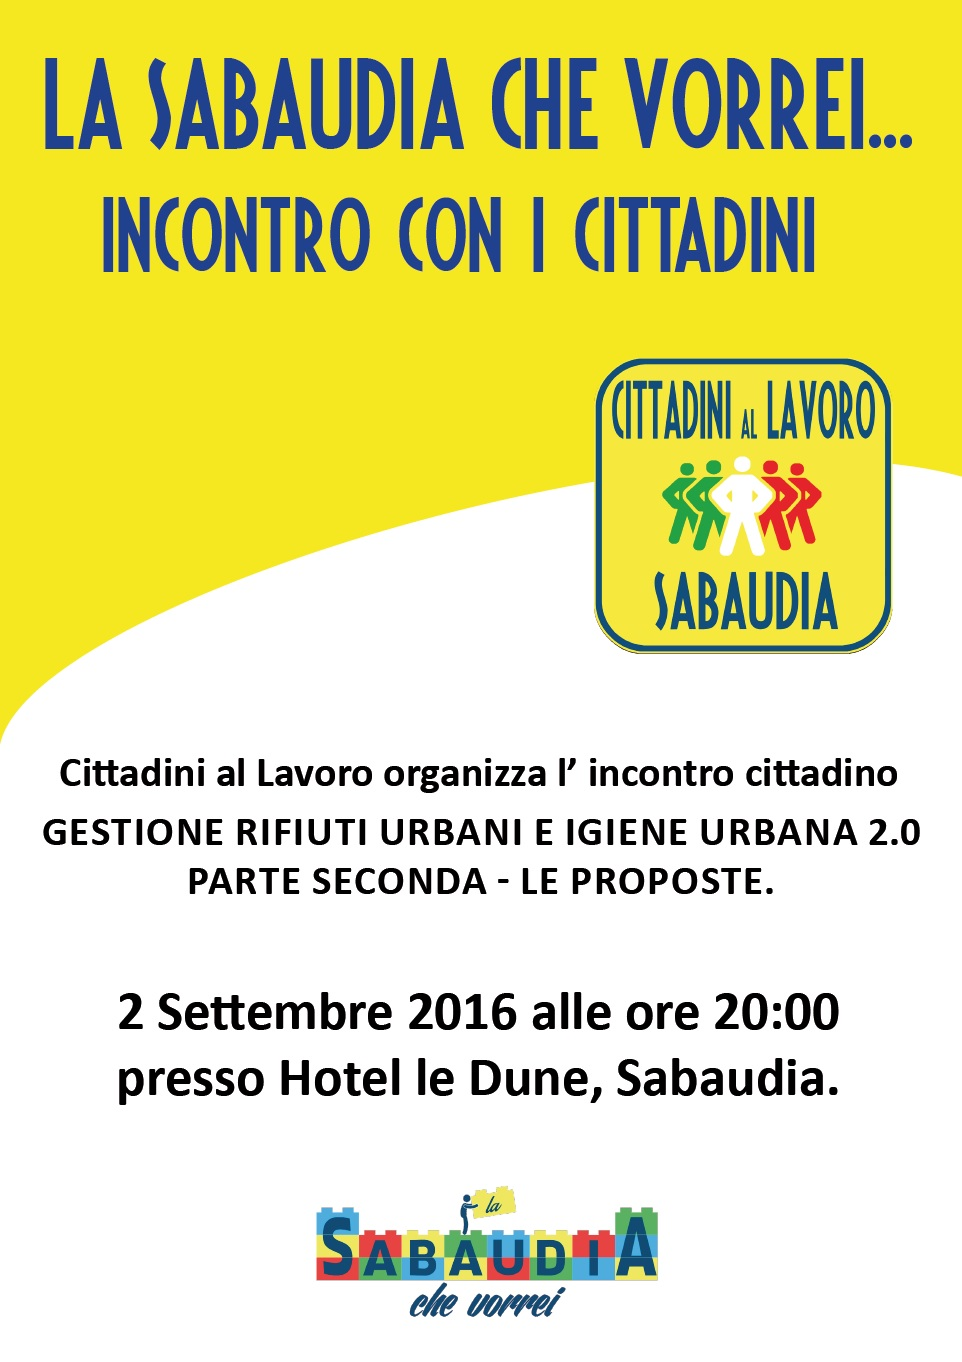 Gestione_rifiuti_urbani_e_igiene_urbana_2.0